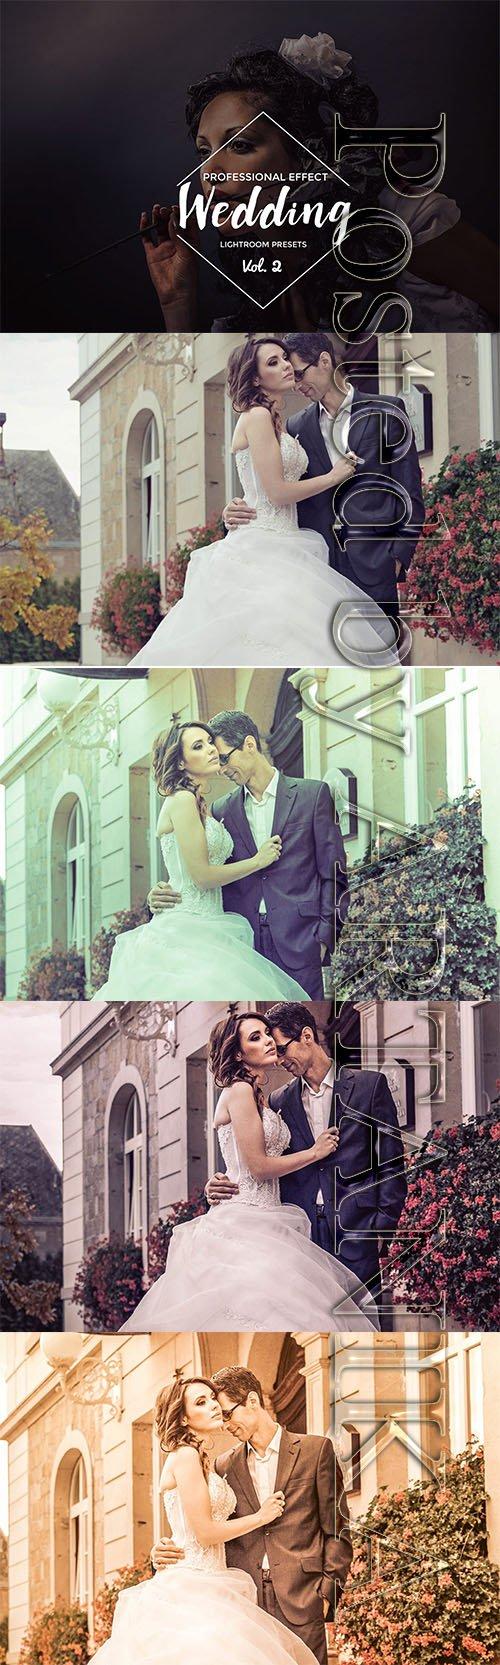 Wedding Lightroom Presets Vol. 2